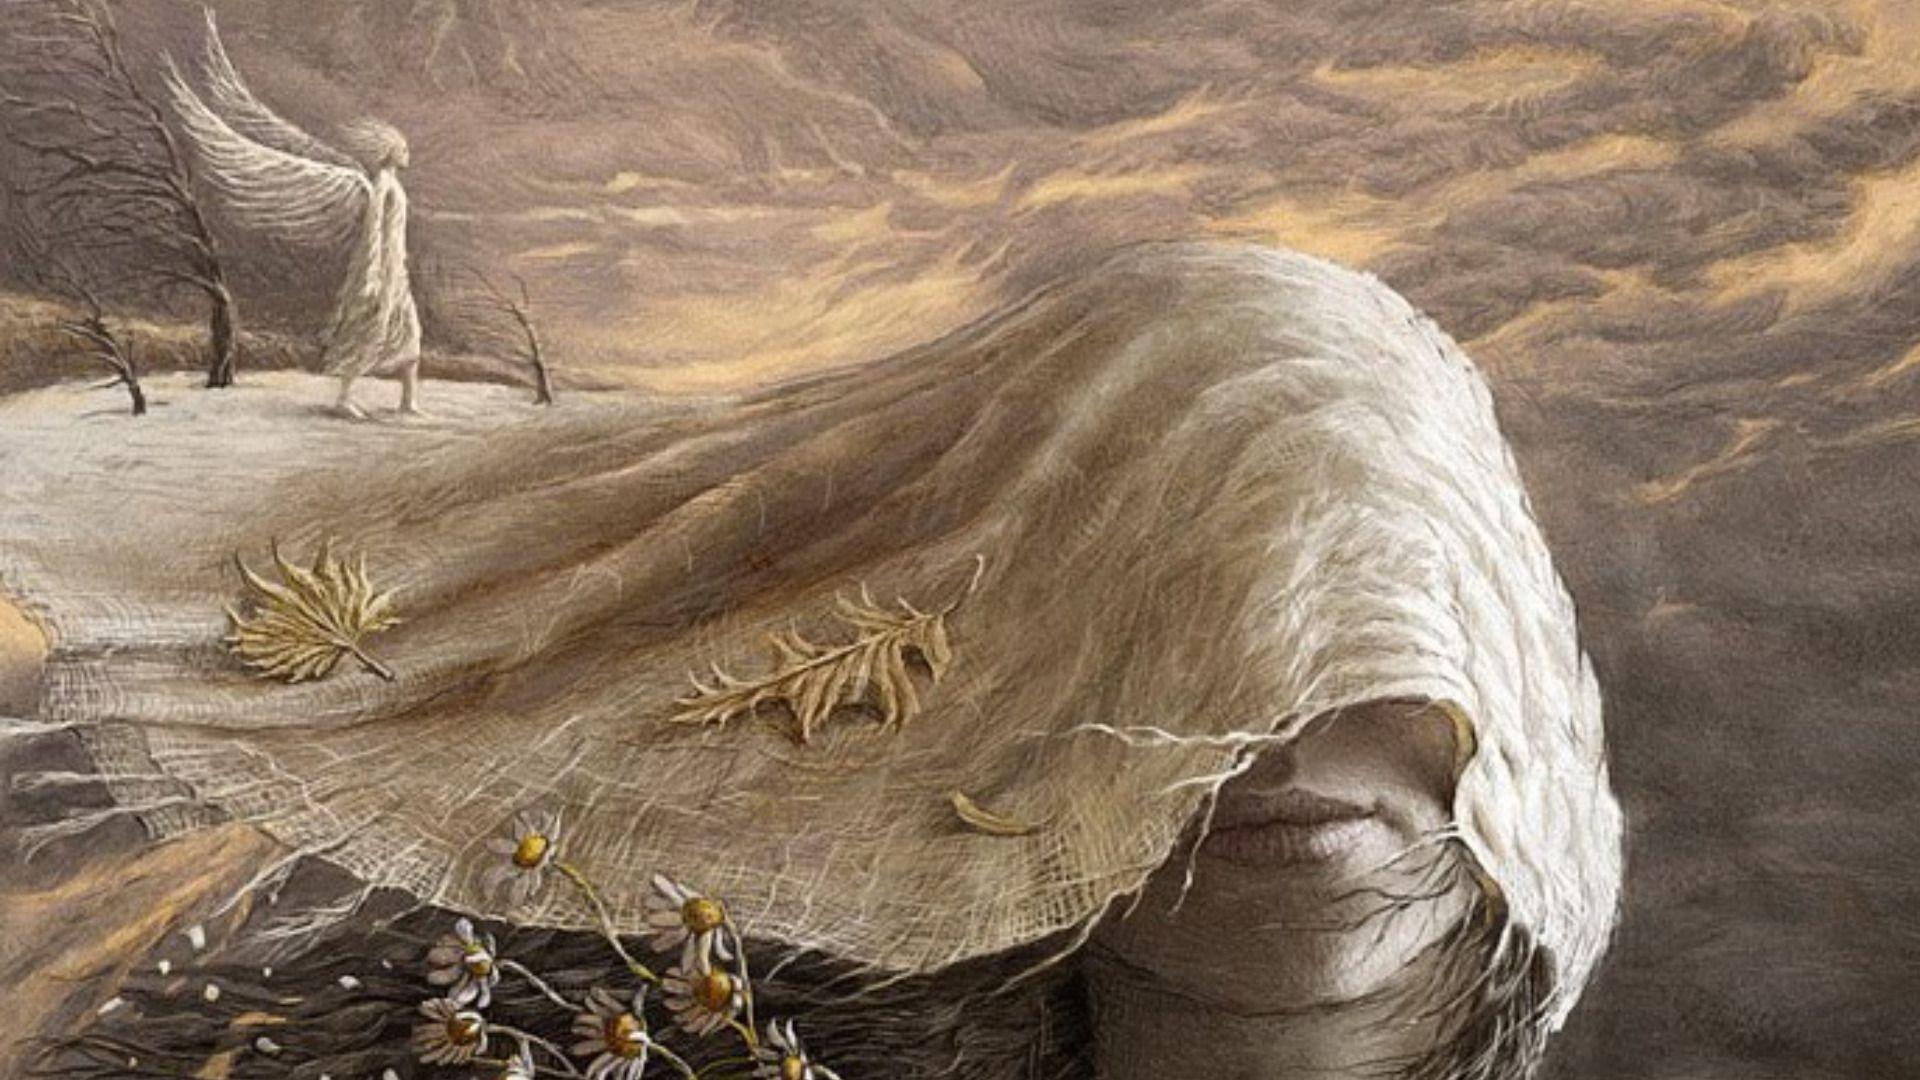 Download Wallpaper Horse Angel - 3951d512a5e6b5ebf2d2532a4e73d970  Picture_93628.jpg